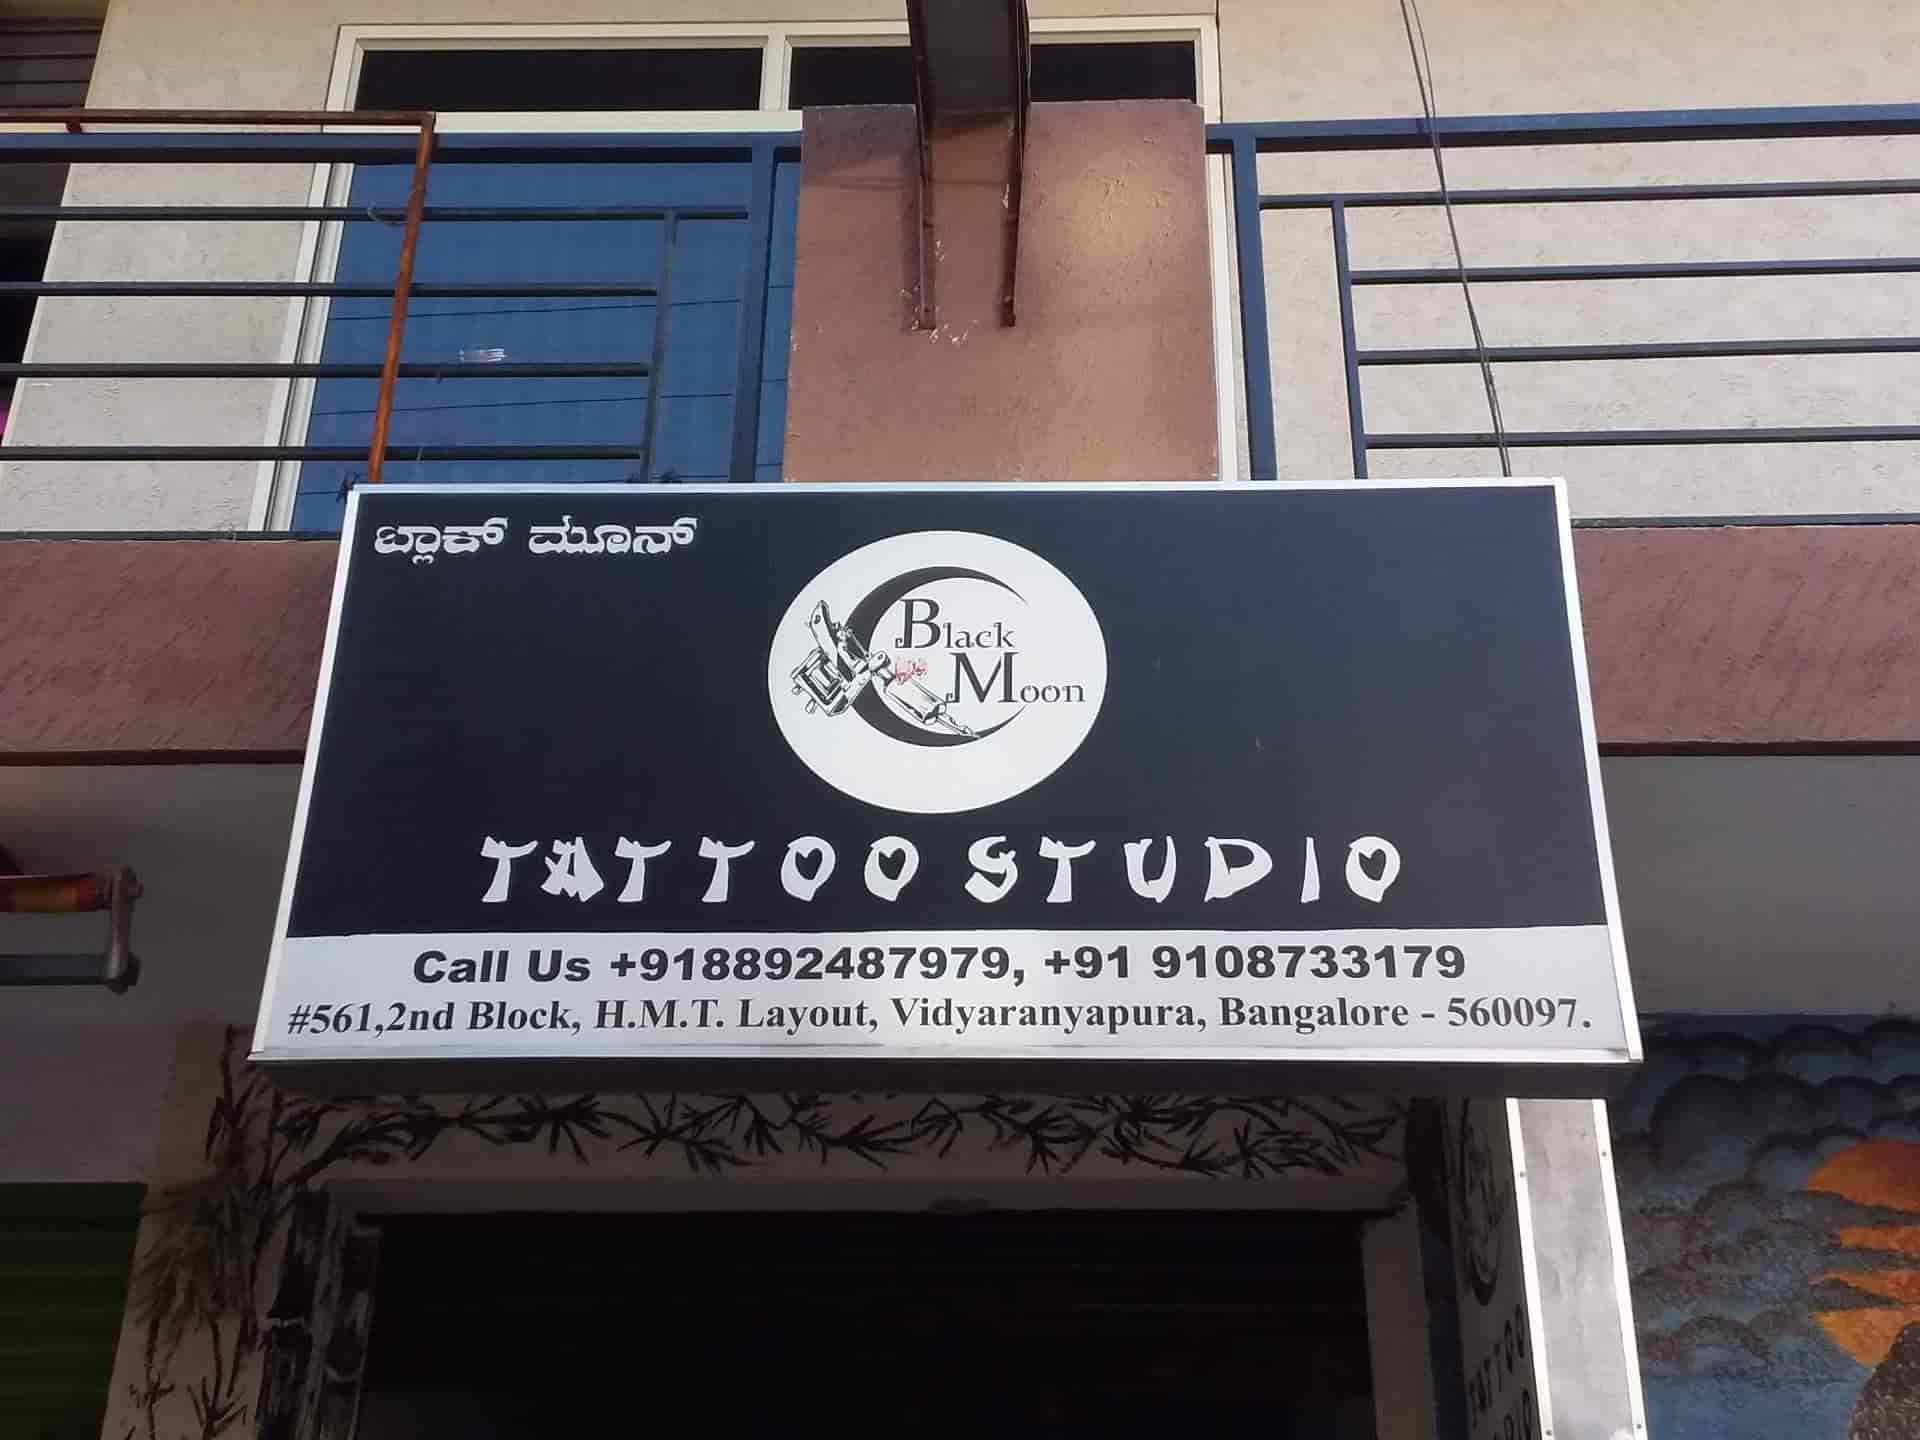 1ebfe1504 Black Moon Tattoo Studios, Vidyaranyapura - Tattoo Artists in Bangalore -  Justdial